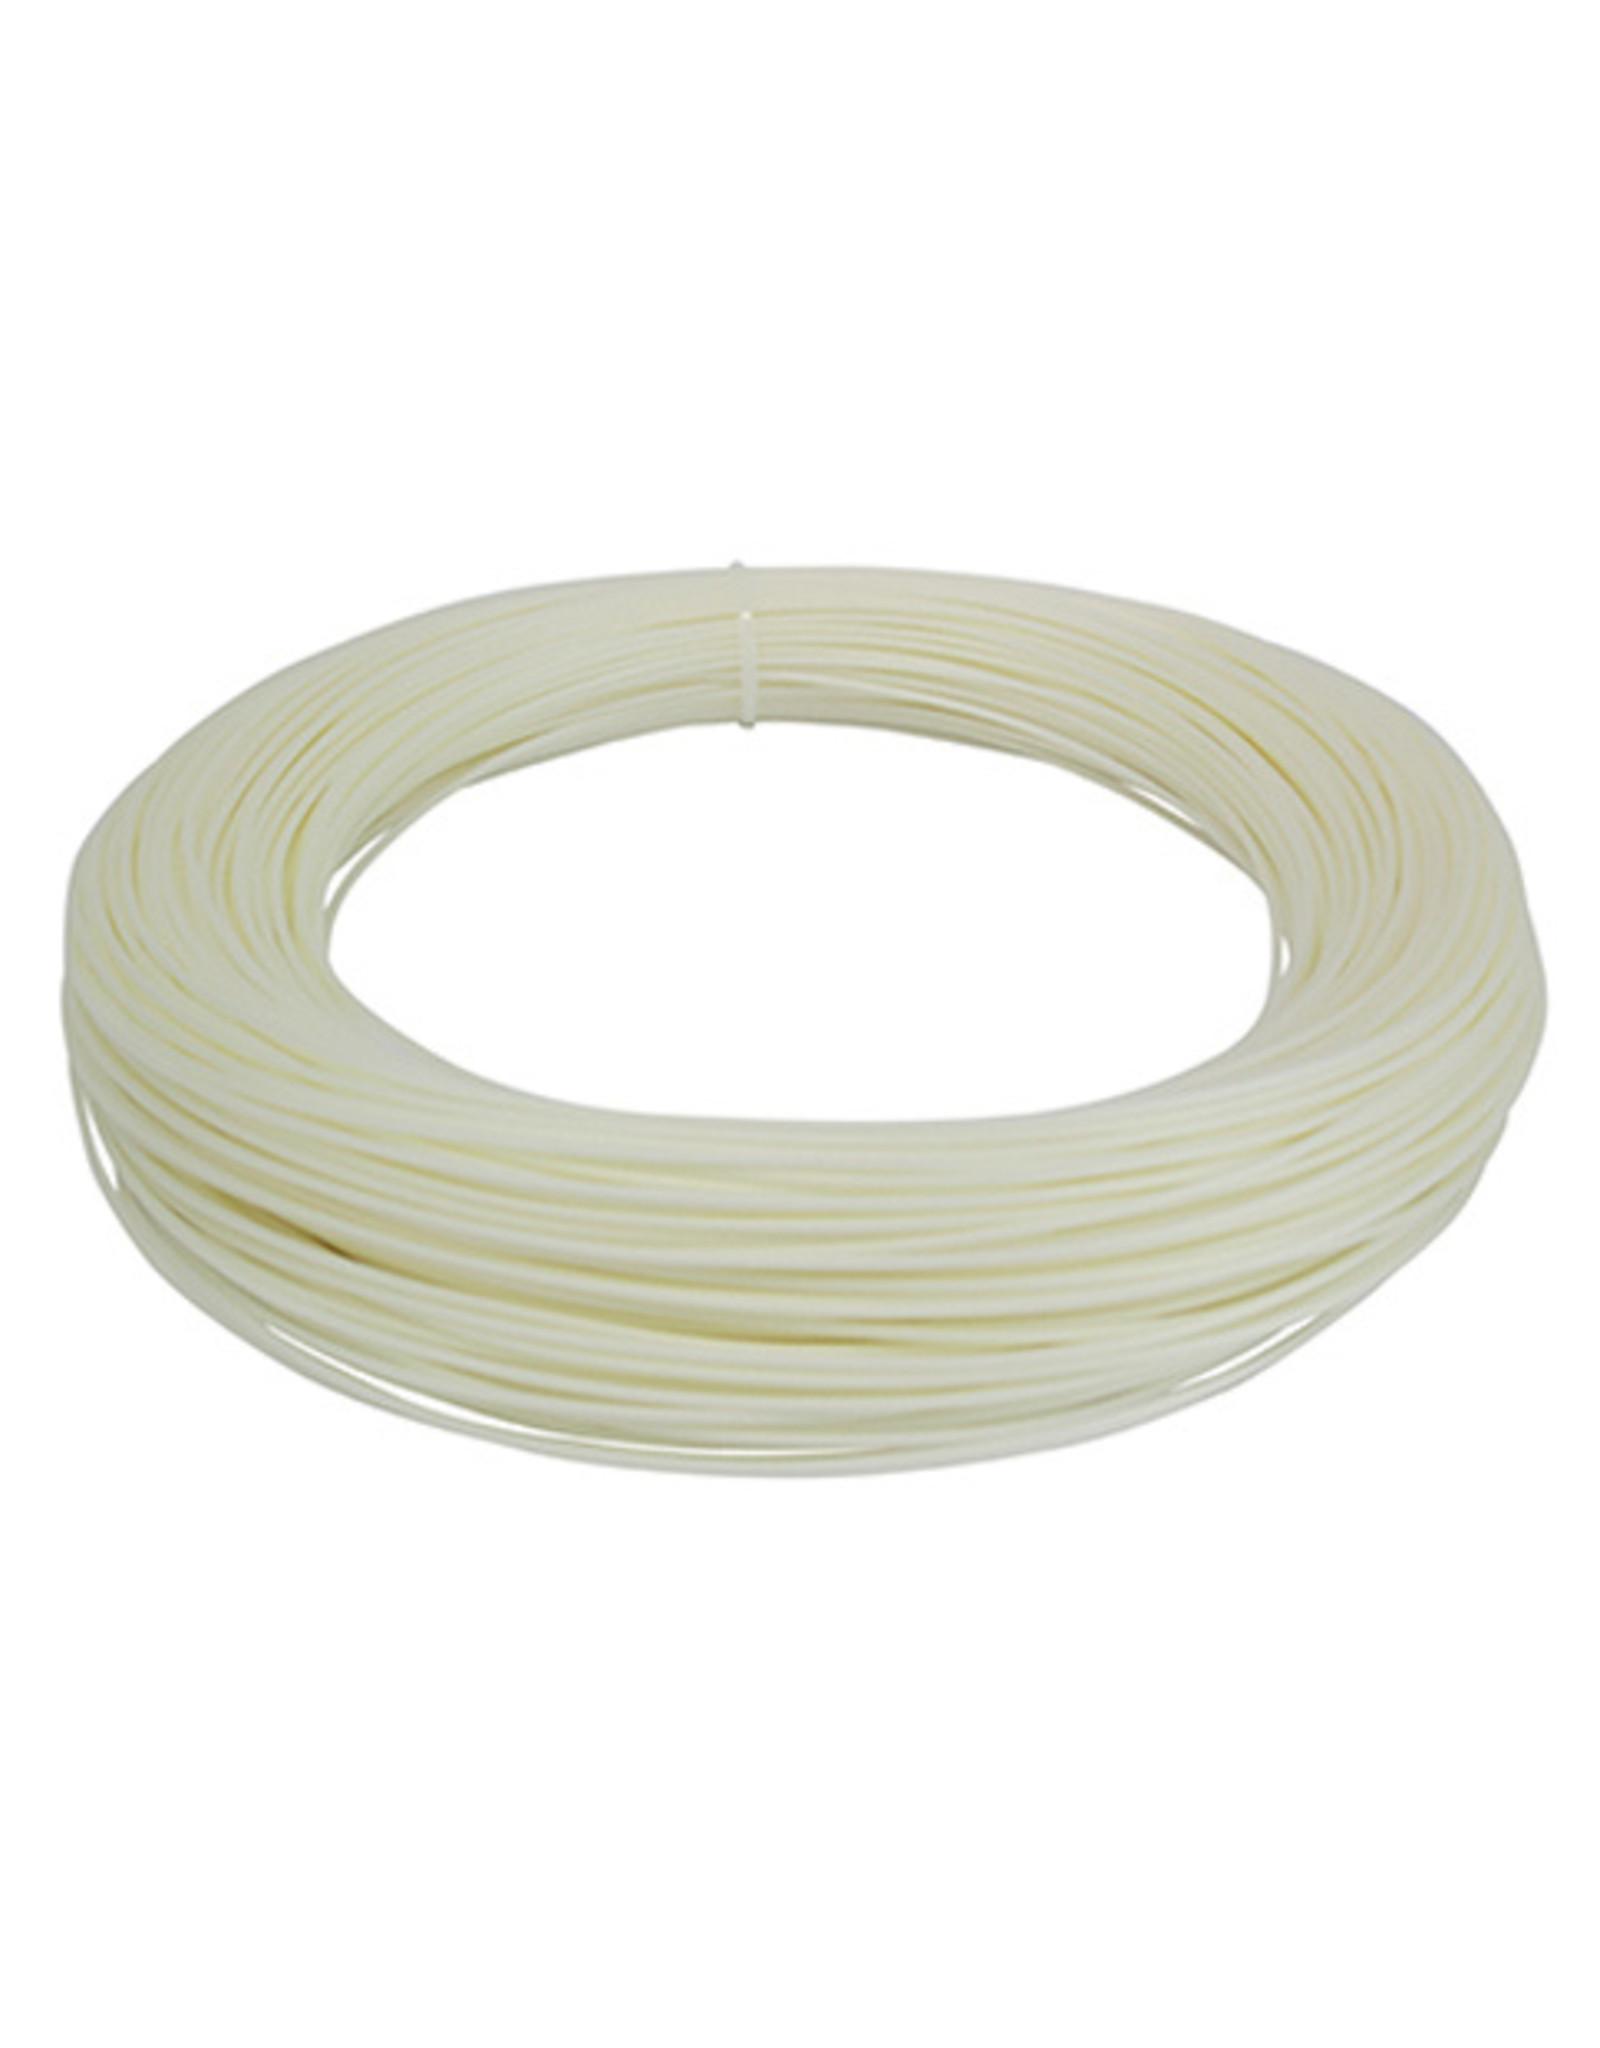 LAY Filaments LAYFELT 1.75mm, 0.25kg